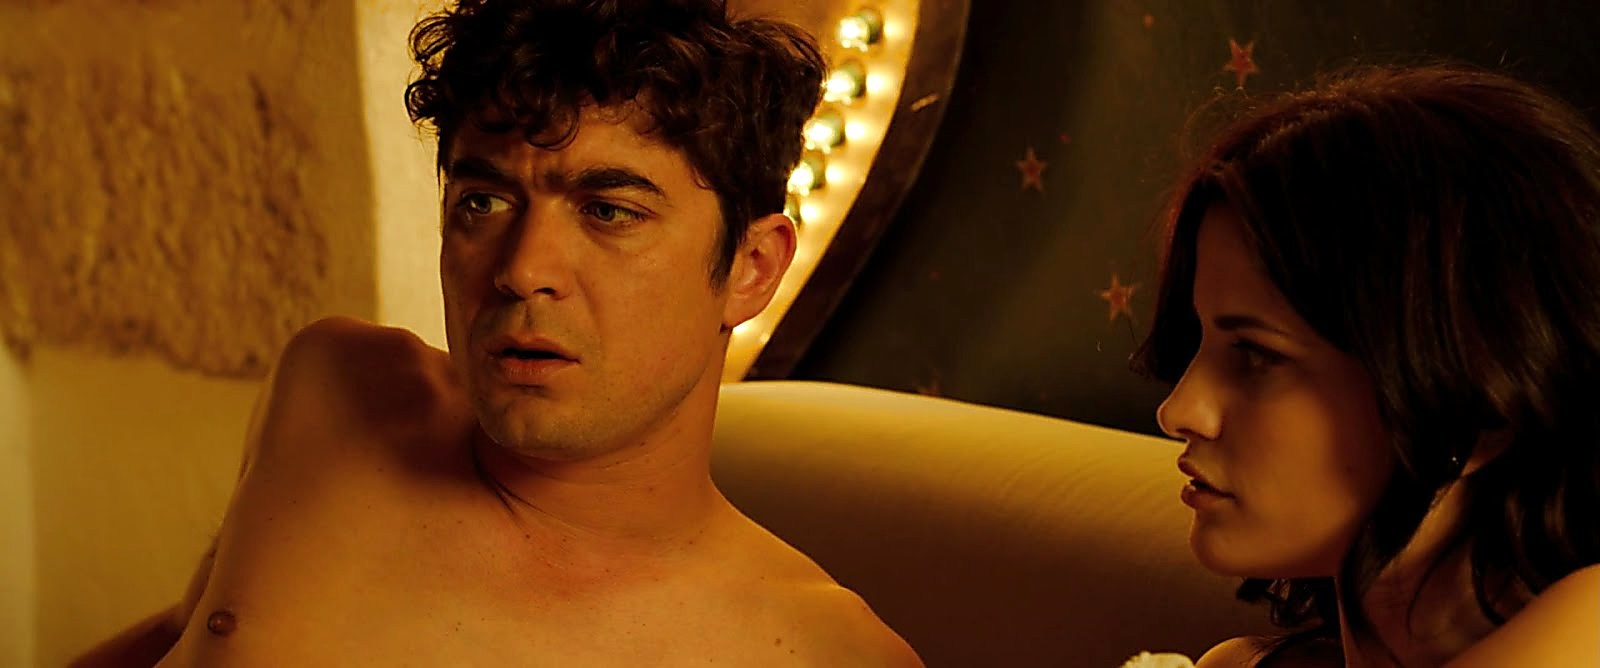 Riccardo Scamarcio sexy shirtless scene December 8, 2017, 3pm